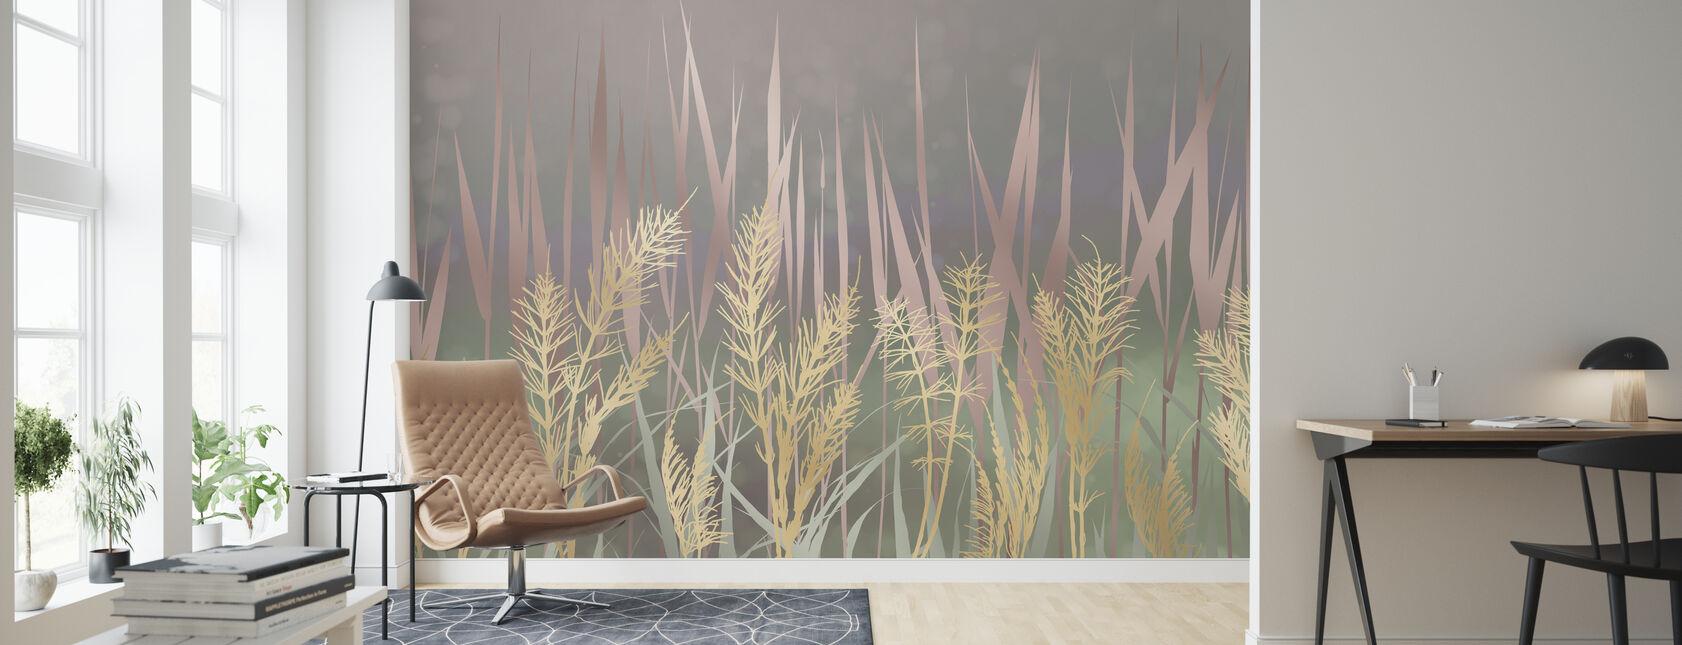 Lightening Grass II - Wallpaper - Living Room